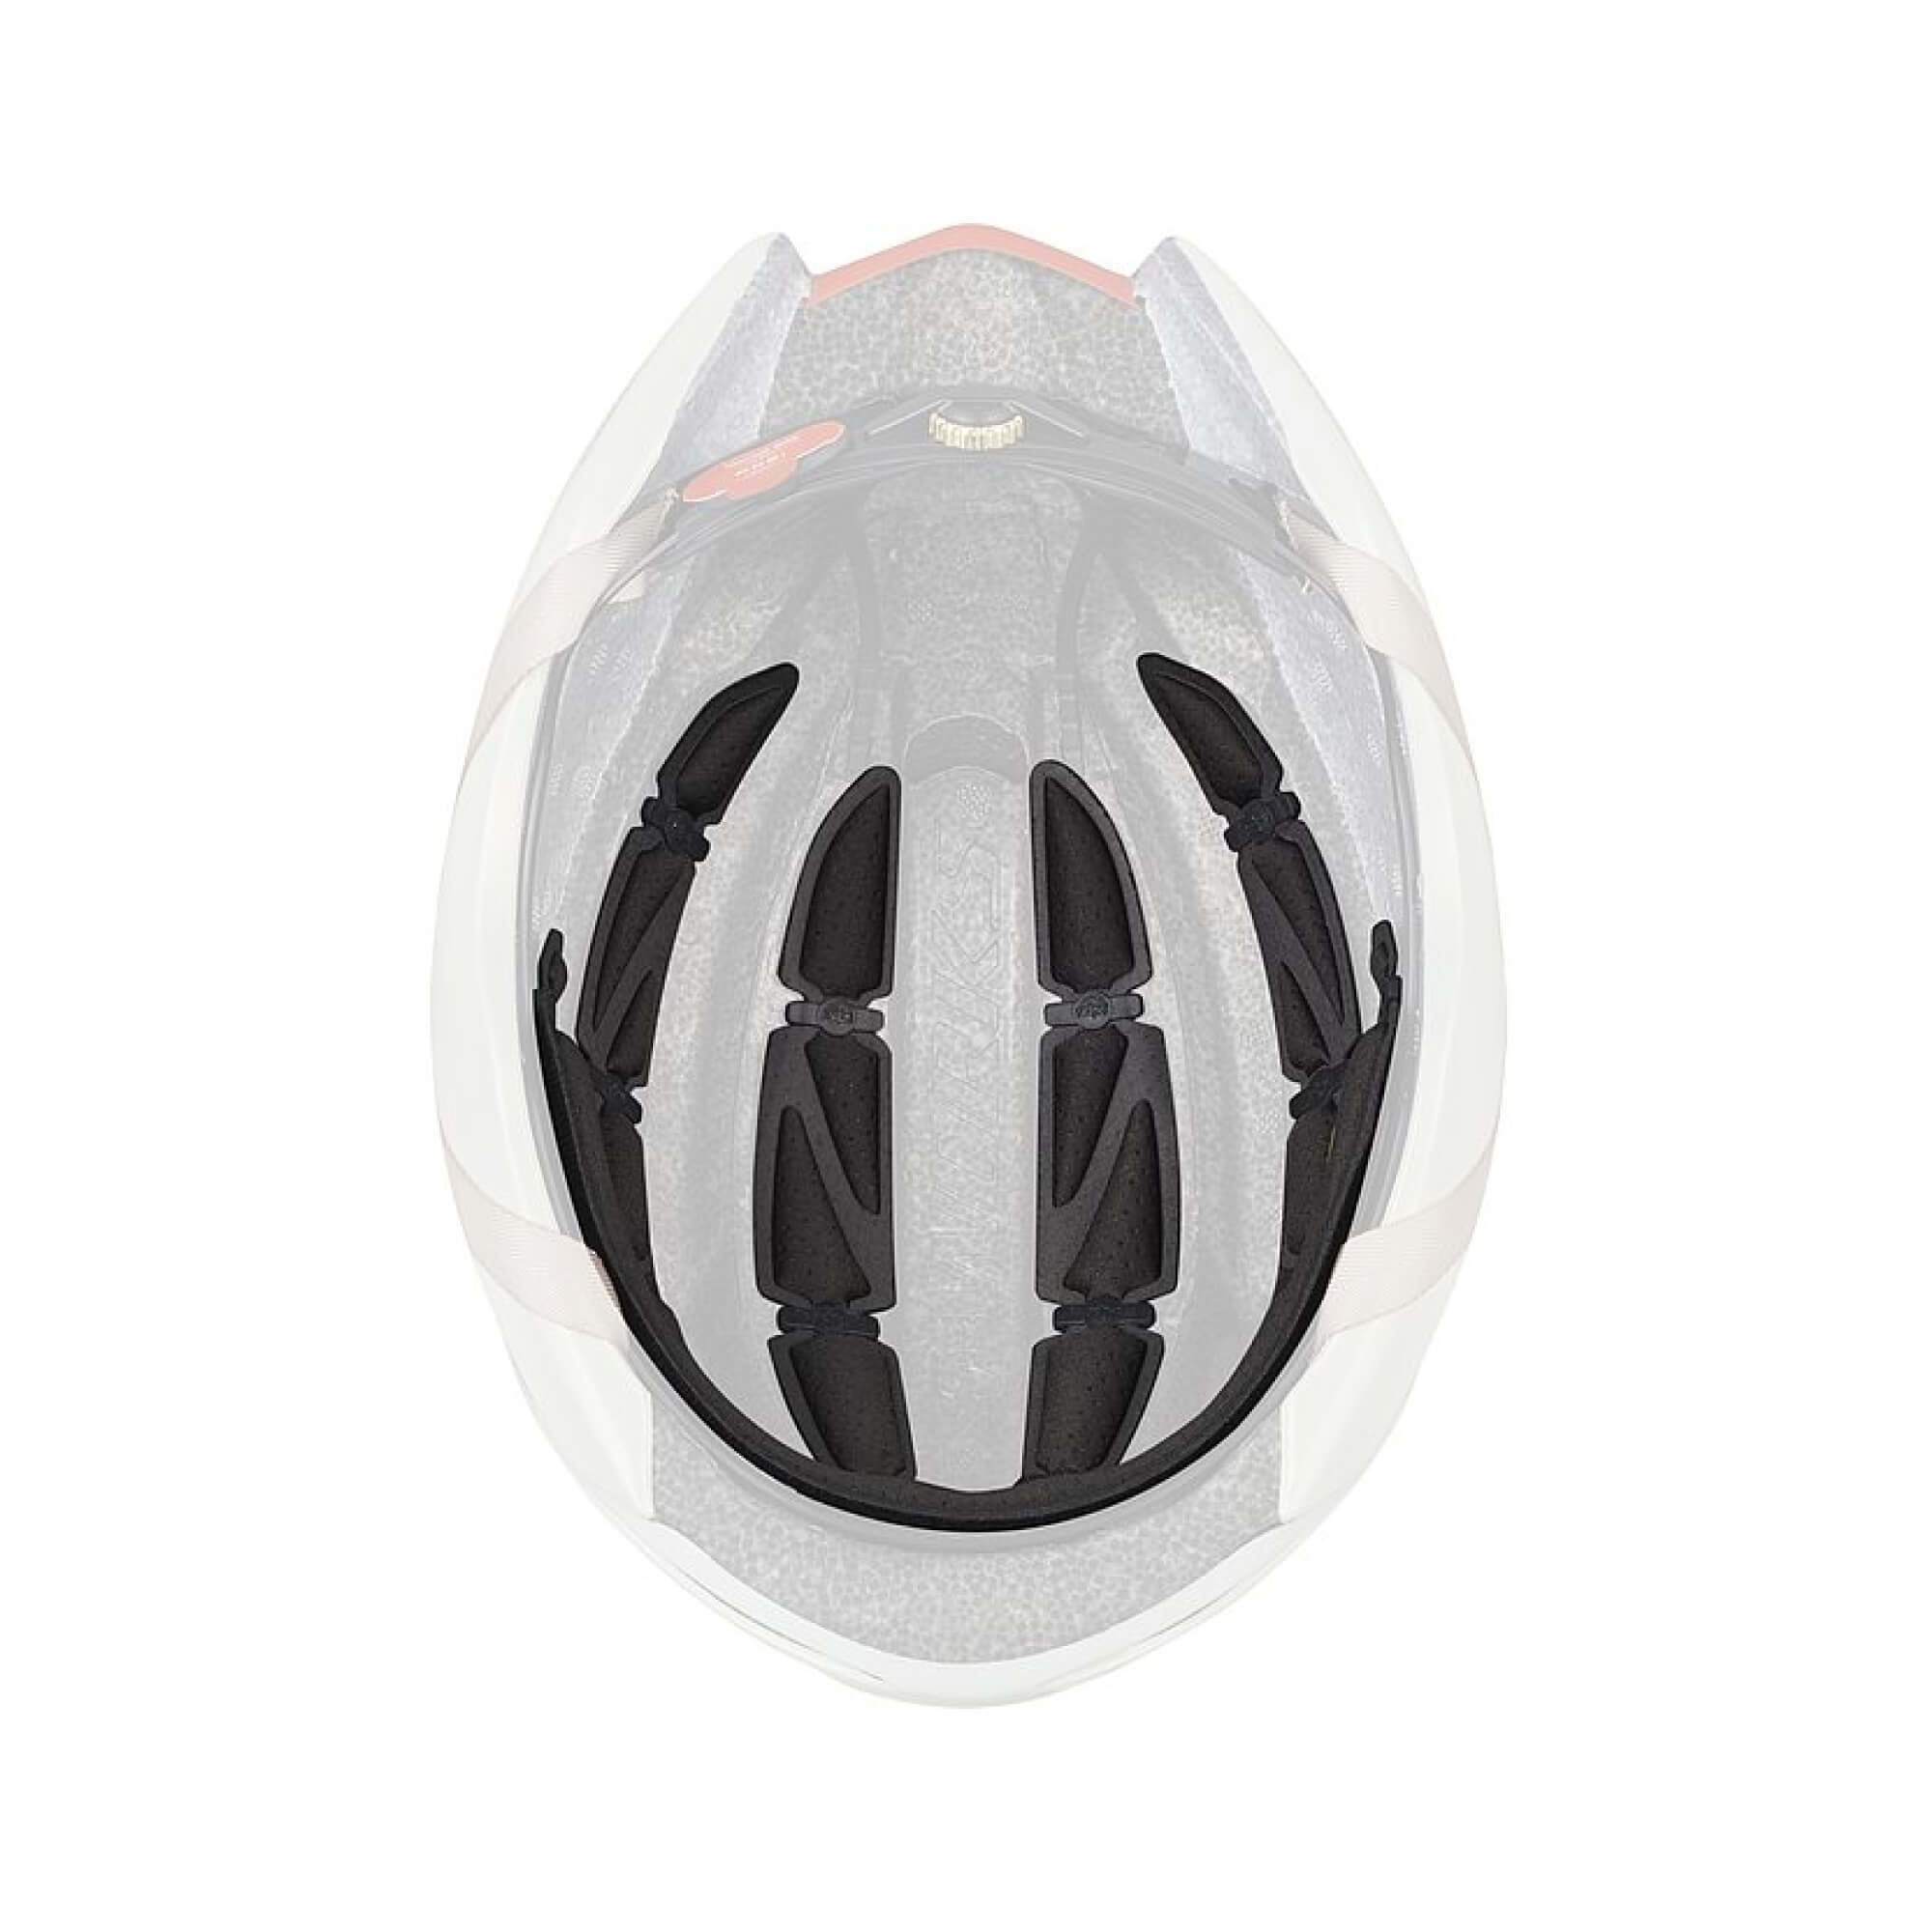 S-Works Evade II Helmet Angi Mips Sagan Disruption 2022-8